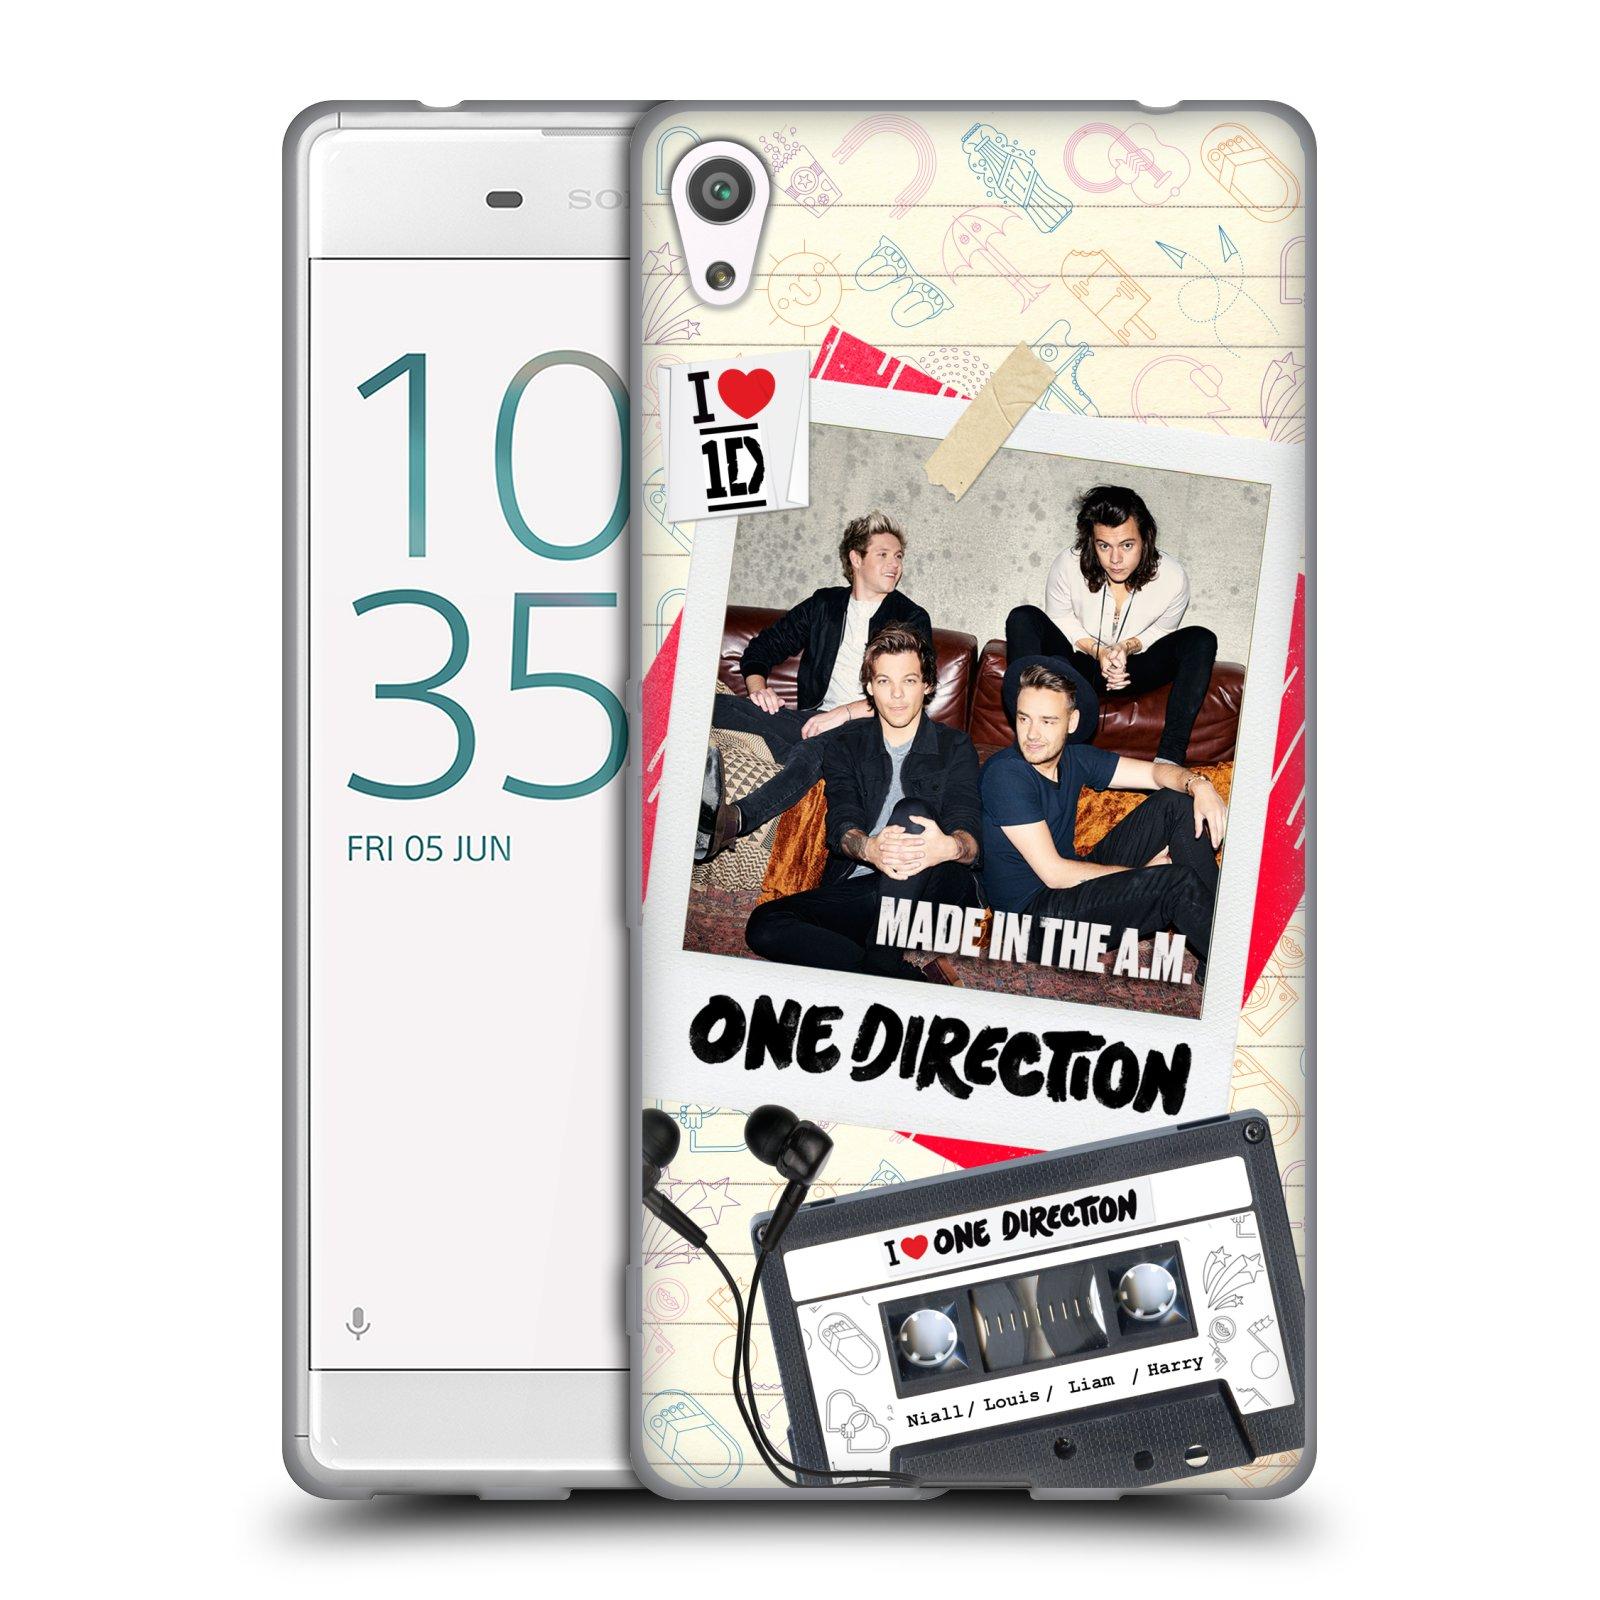 Silikonové pouzdro na mobil Sony Xperia XA Ultra HEAD CASE One Direction - Kazeta (Silikonový kryt či obal One Direction Official na mobilní telefon Sony Xperia XA Ultra F3211)